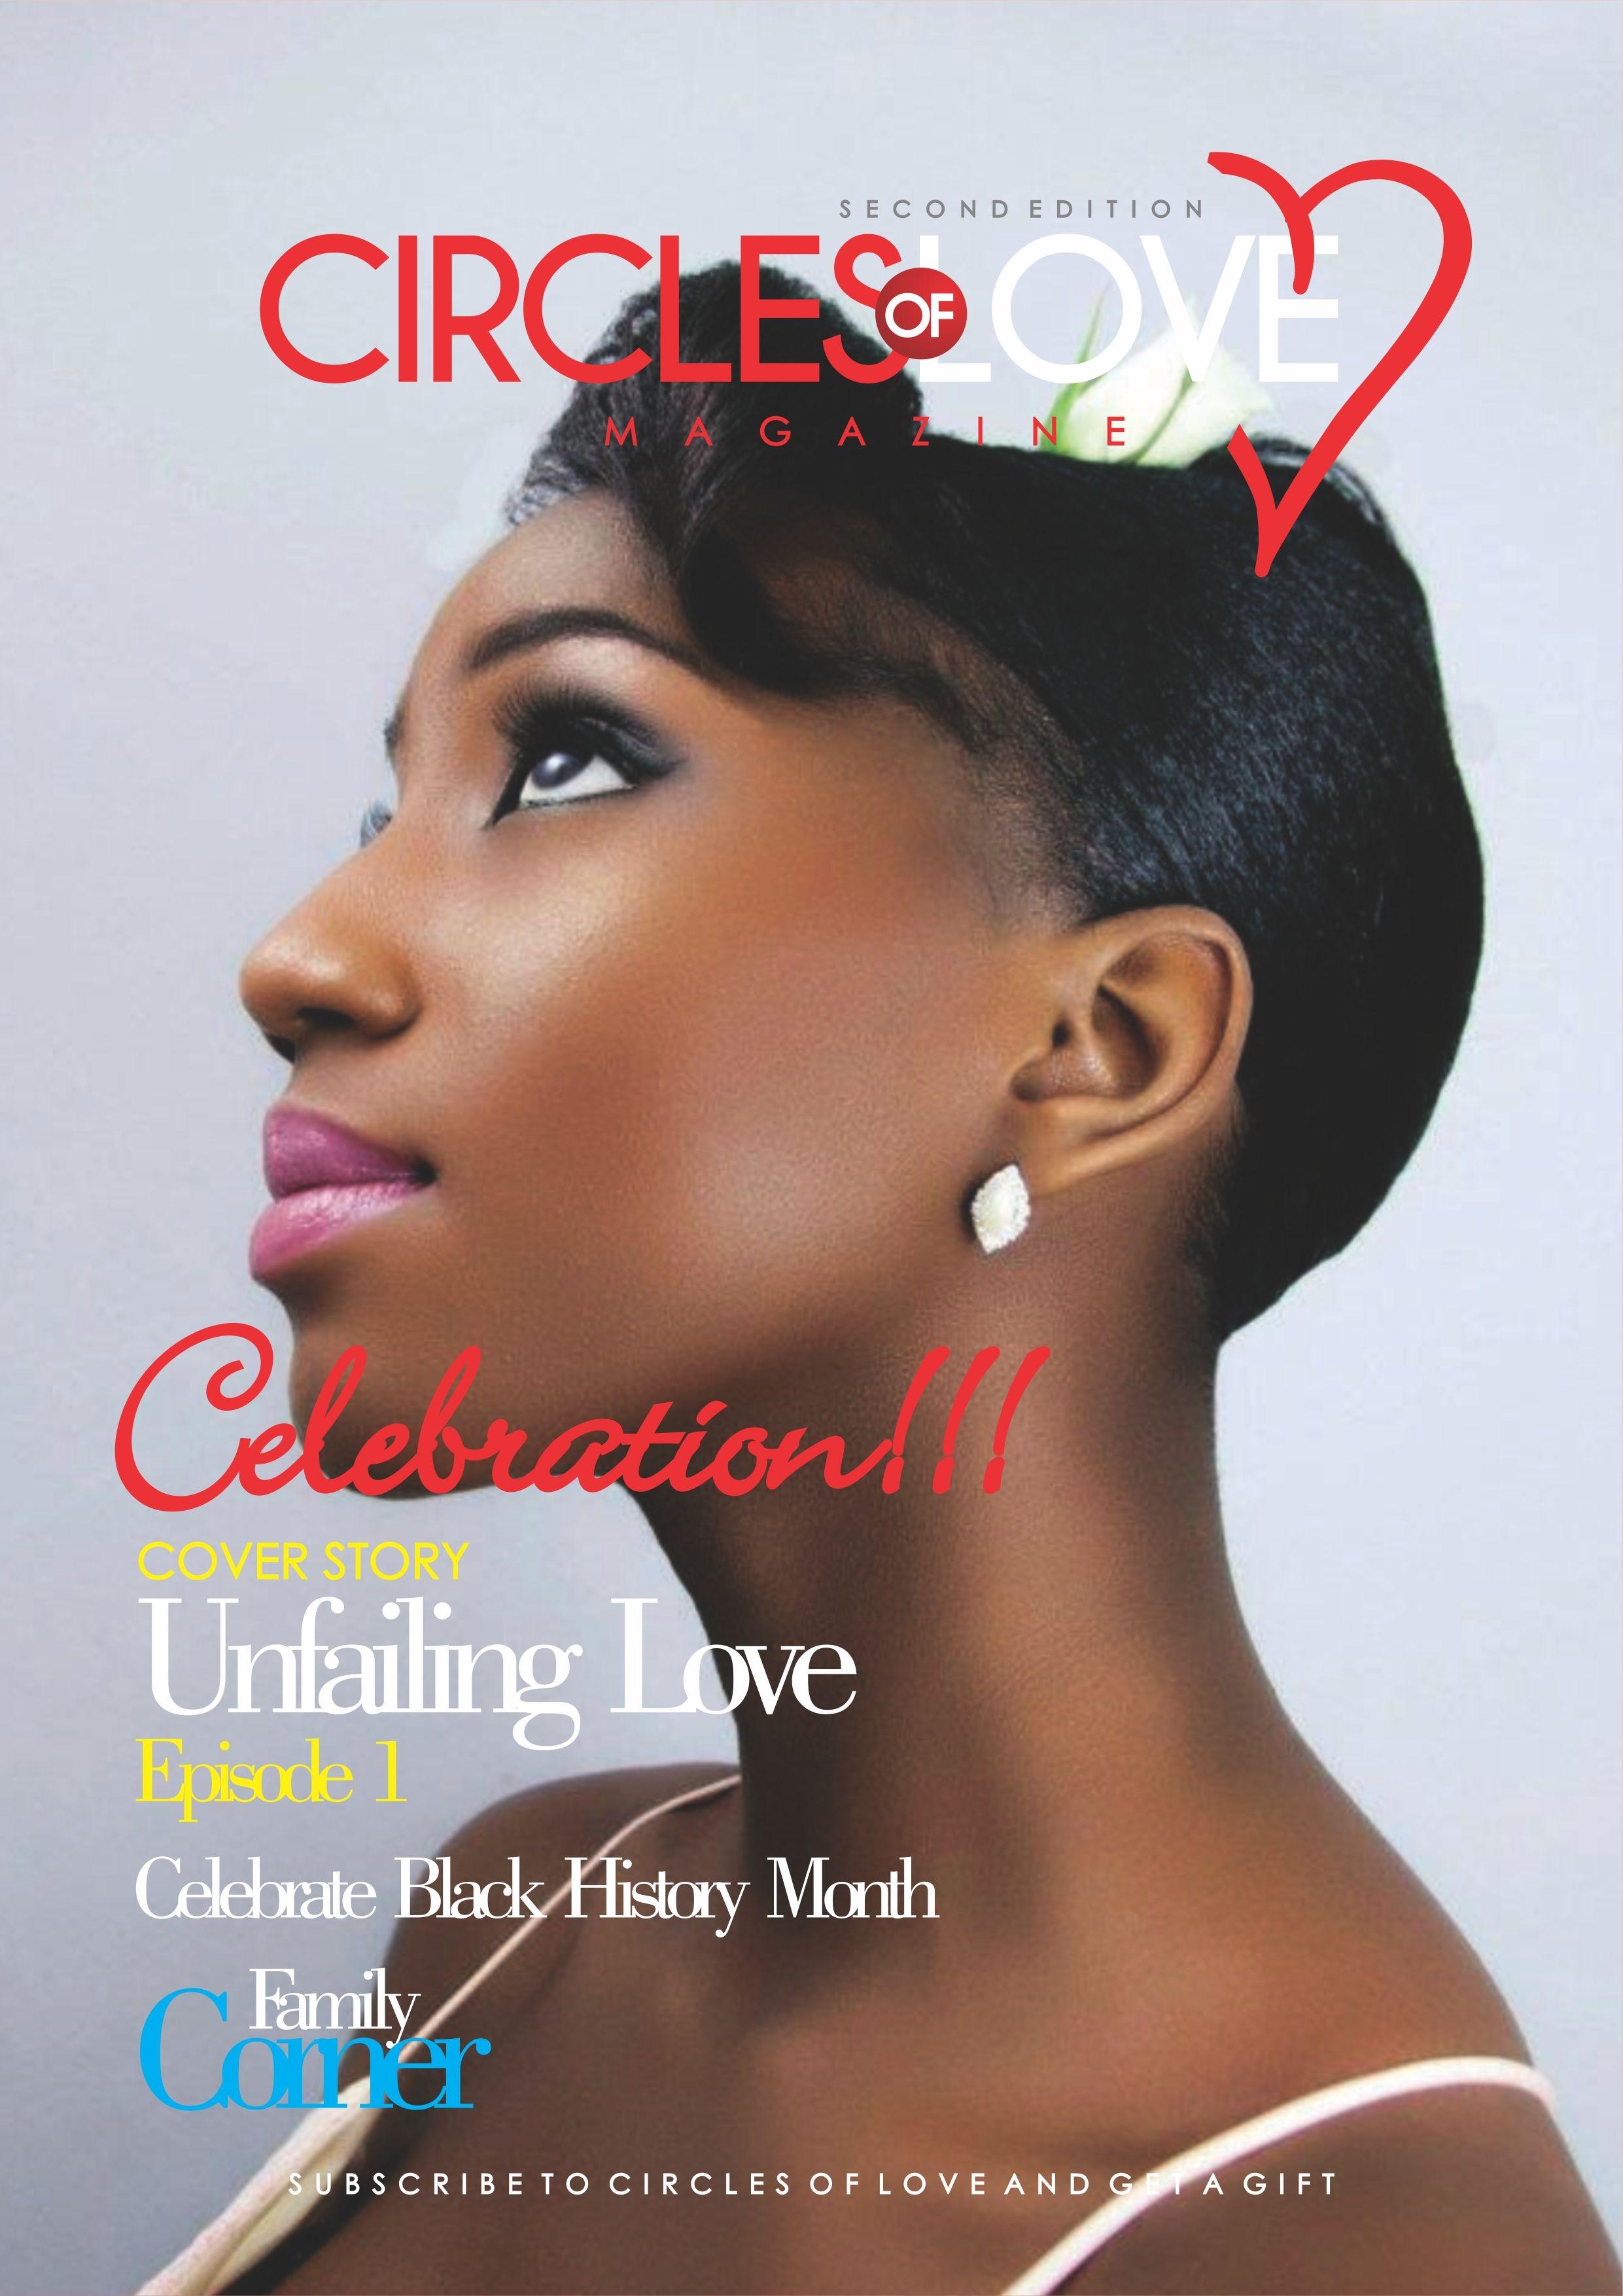 Circles of Love E-Magazine - Celebration! (Circles of Love Magazine)